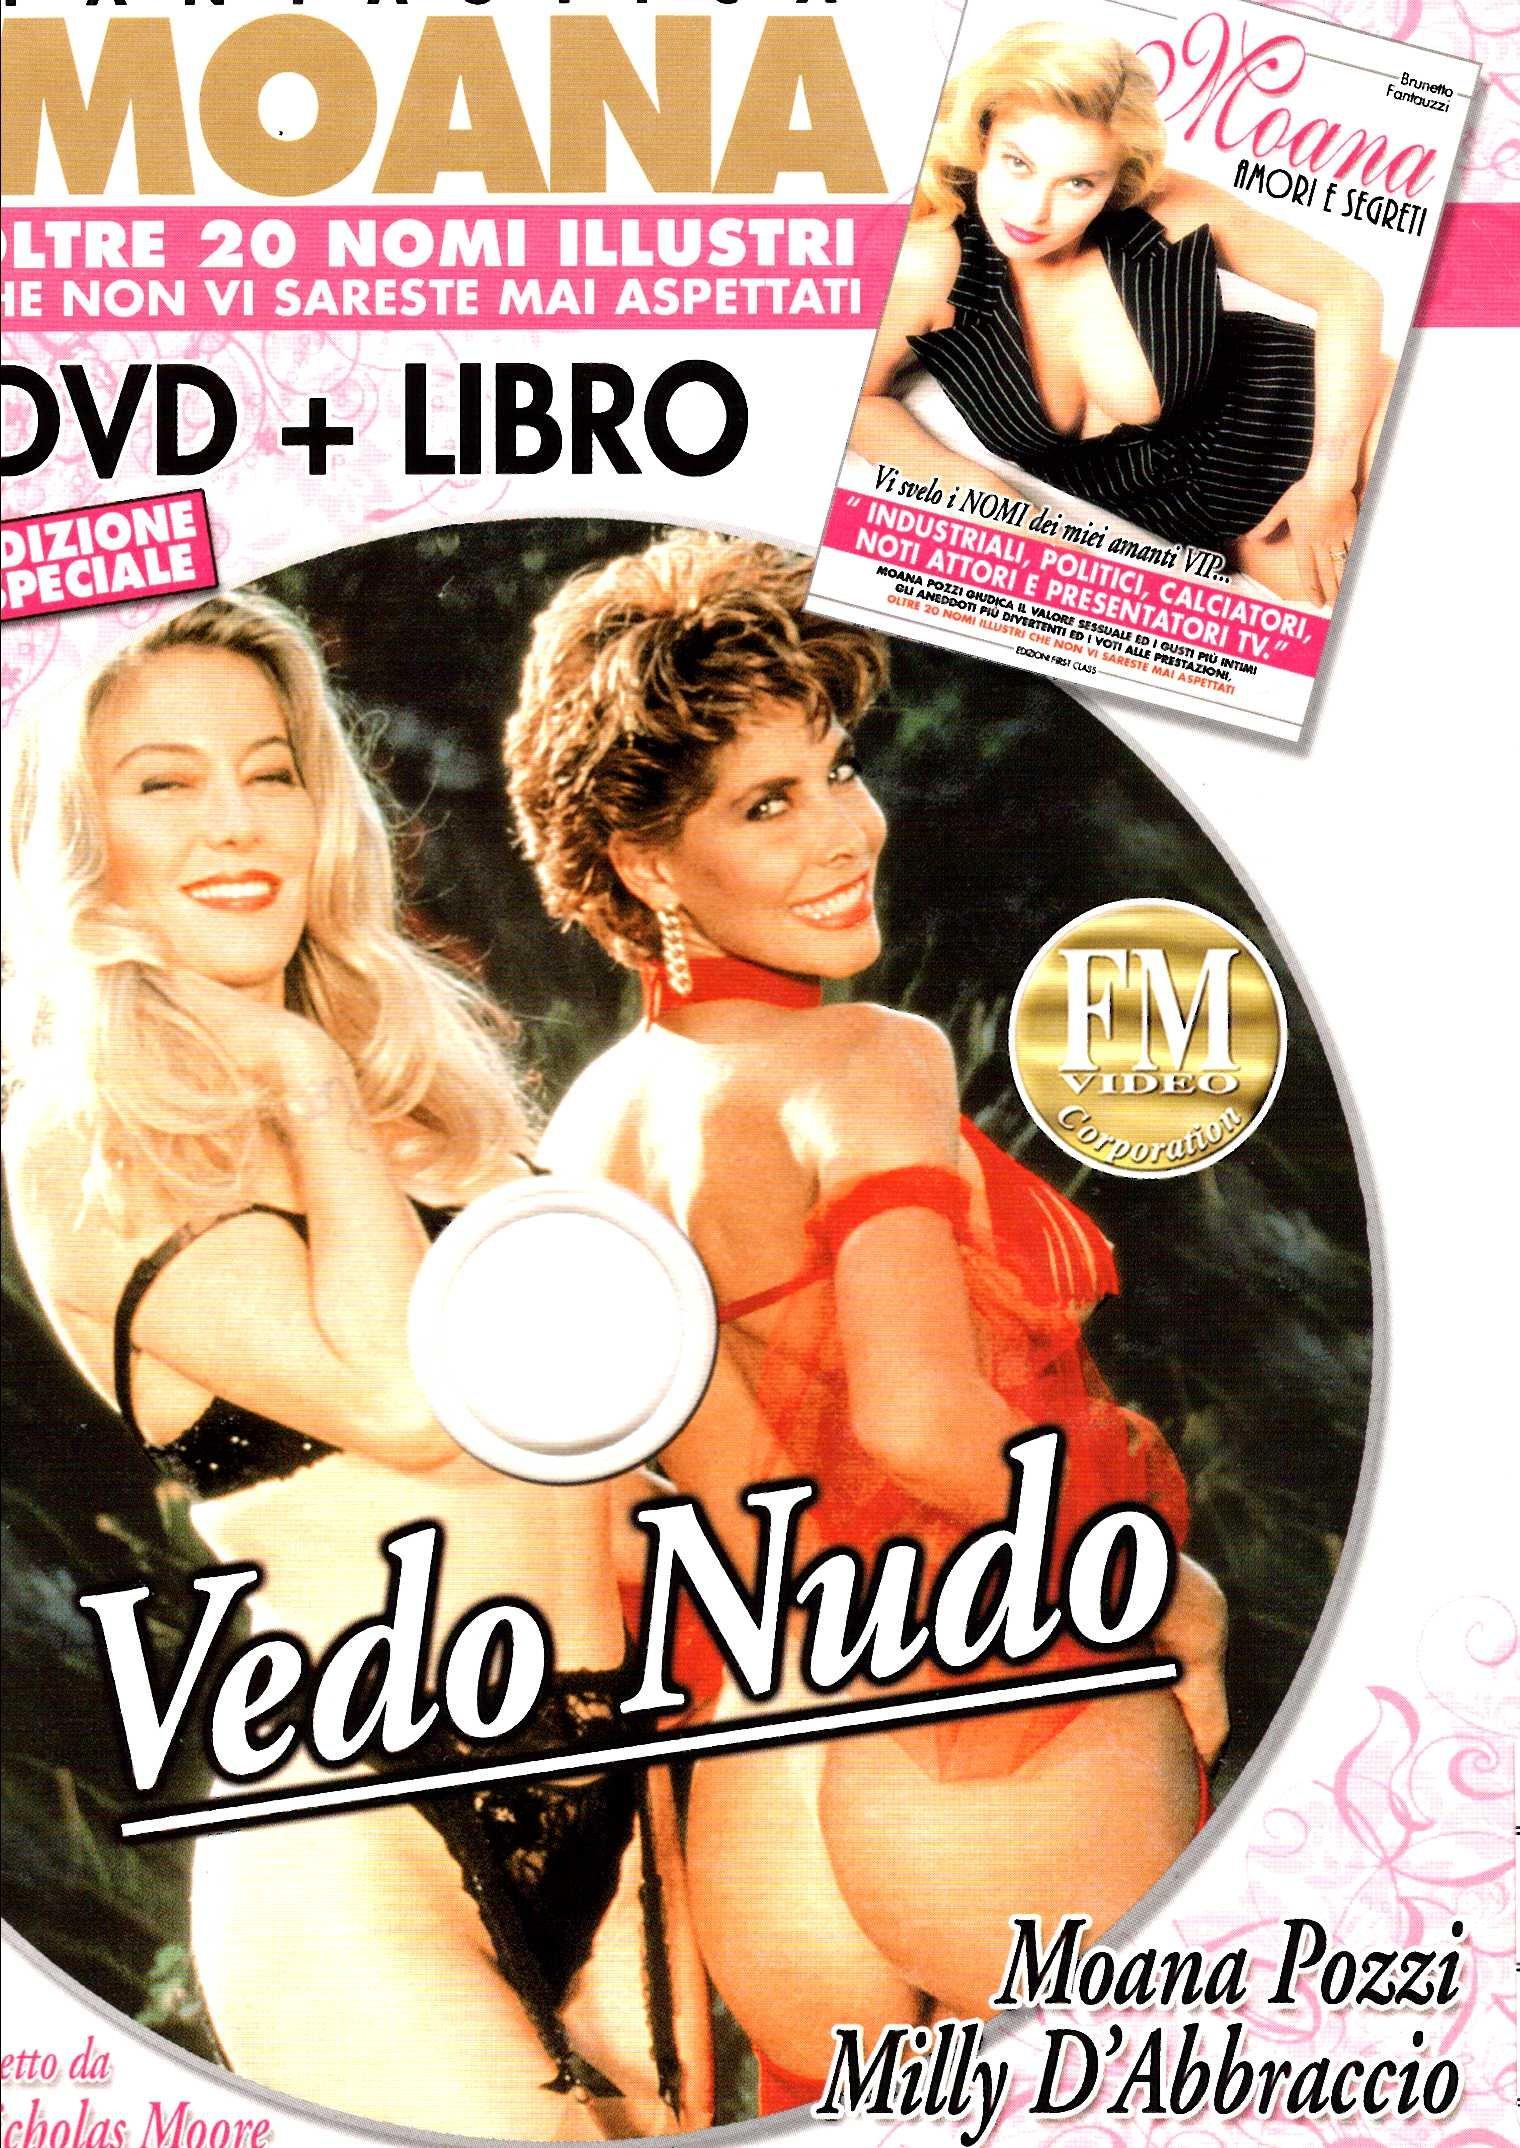 Moana - vedo nudo + Book (XXX Adult) (Dvd) Italian Import